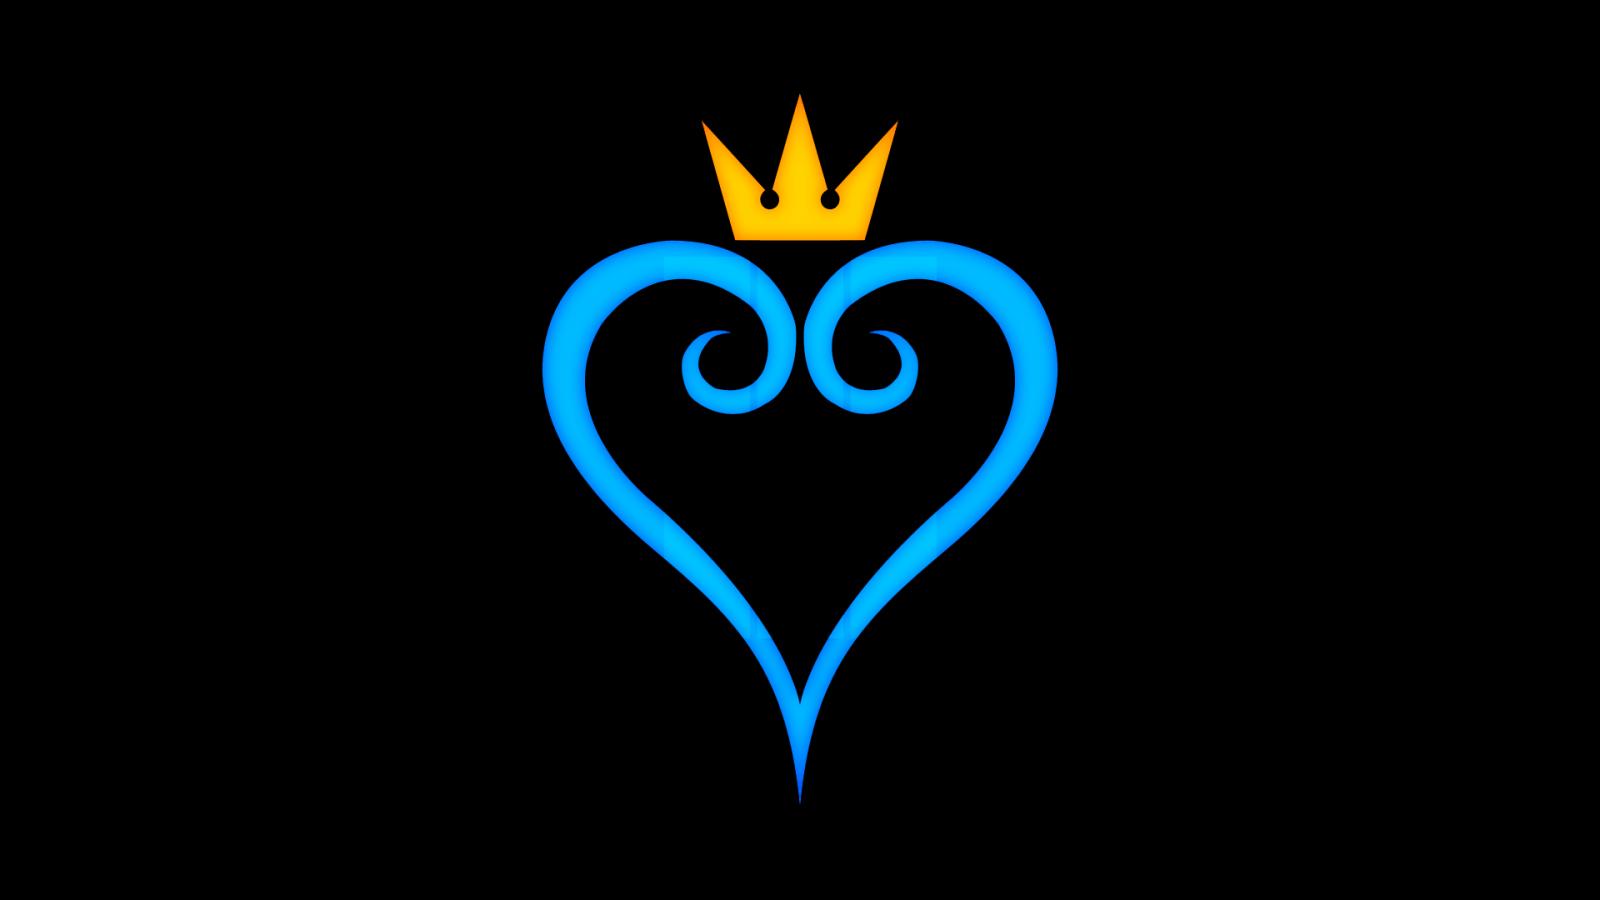 kingdom hearts logo wallpapers